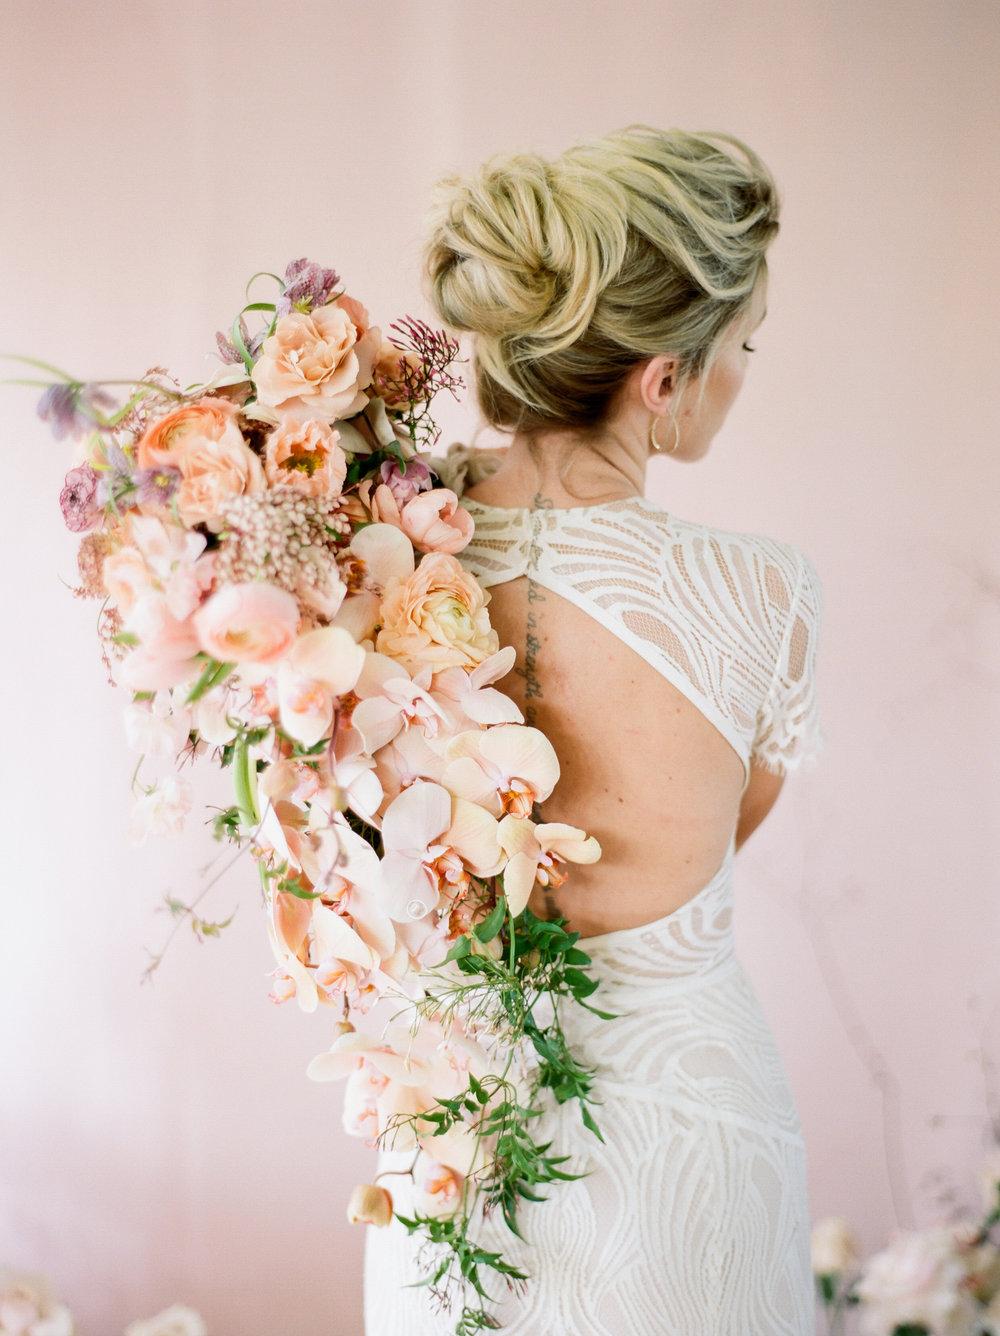 Austin-Wedding-Photography-Prospect-House-Fine-Art-Film-Destination-Dana-Josh-Fernandez-Photography-Dallas-Houston-Luxury-Best-Top-7.jpg